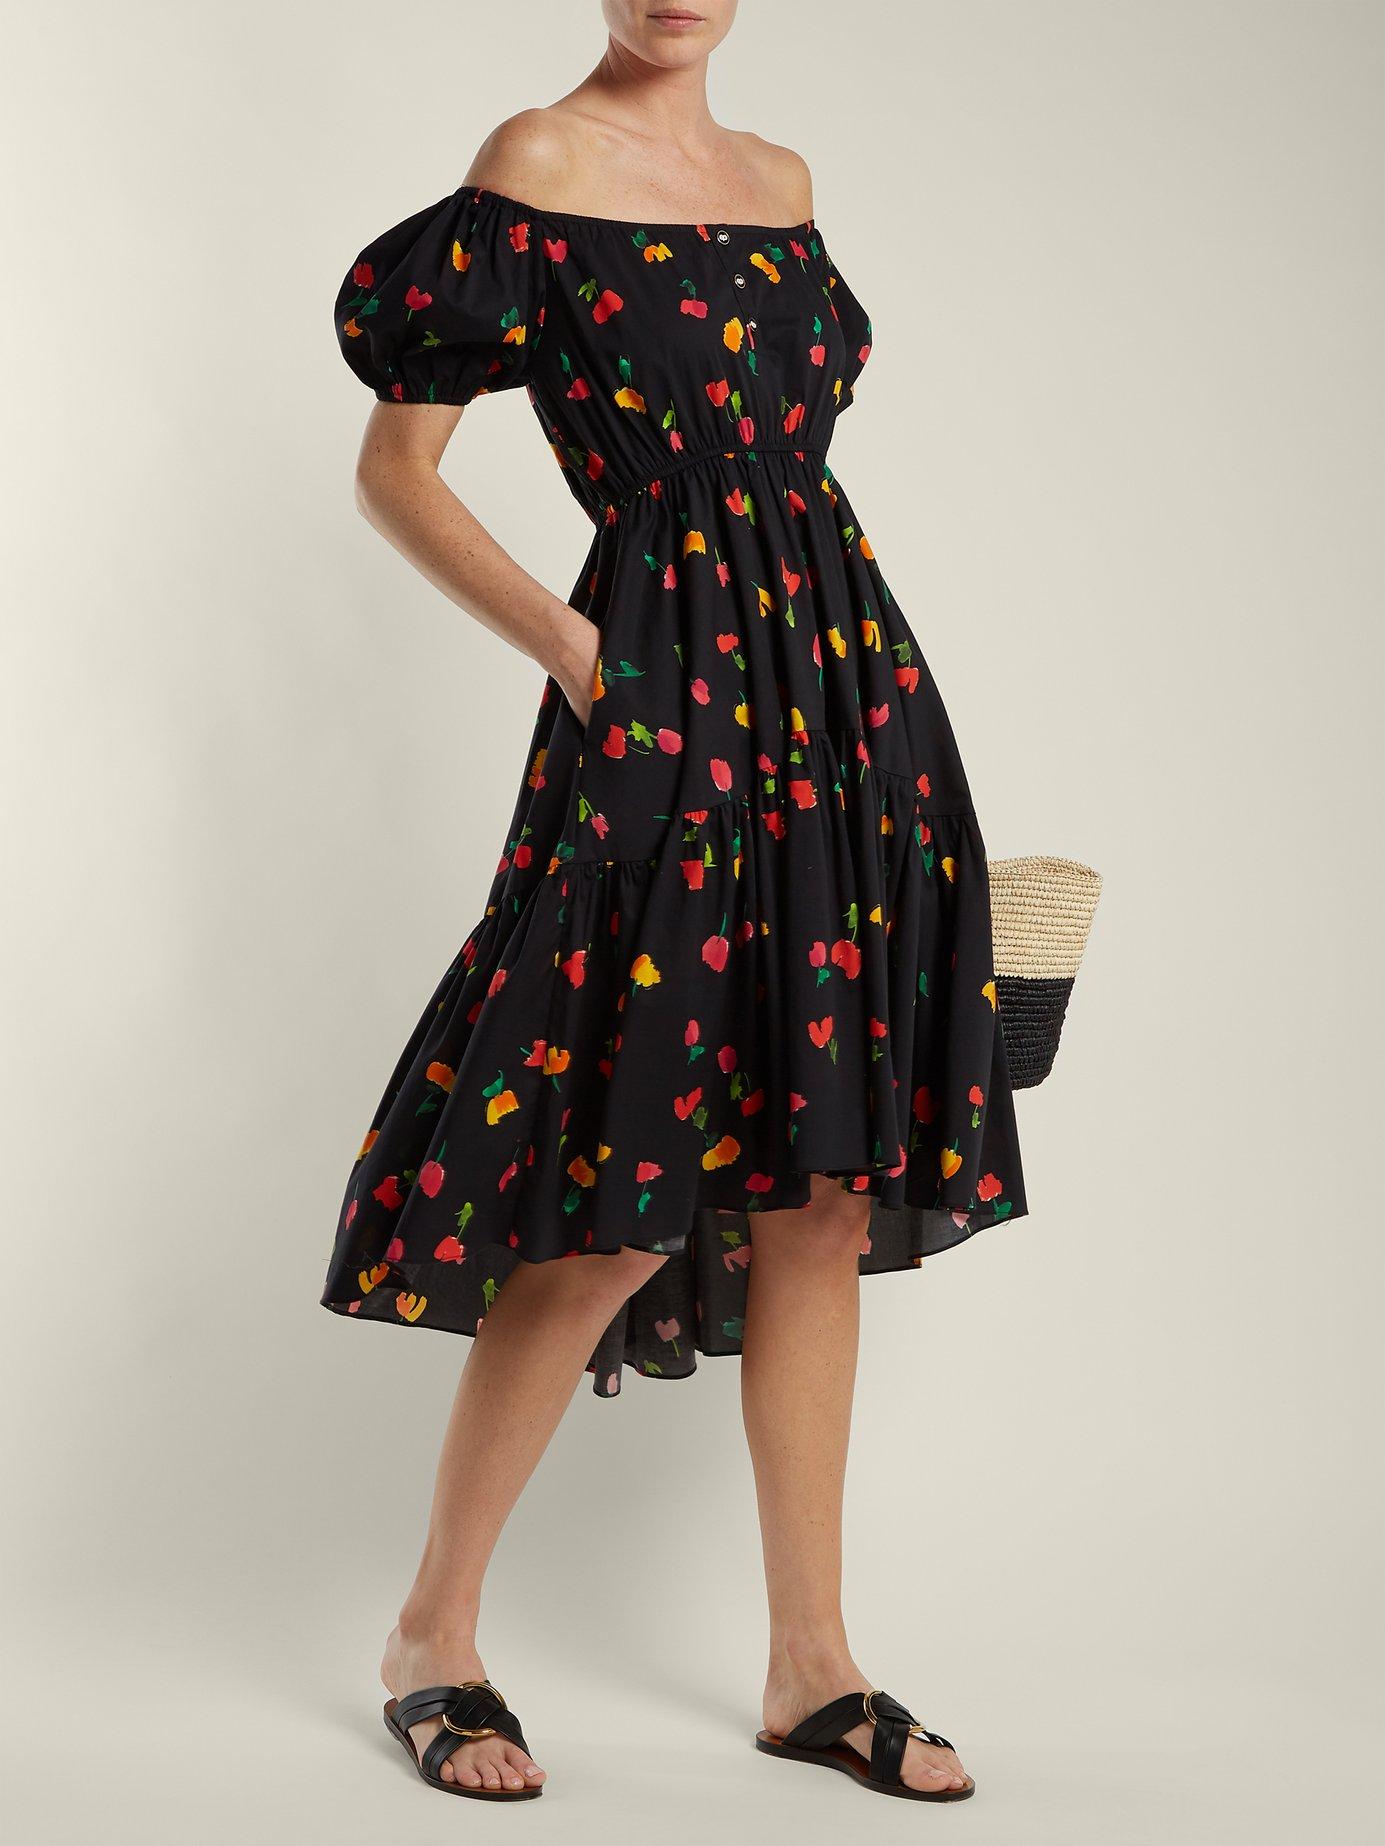 Bardot floral-print cotton-blend dress by Caroline Constas